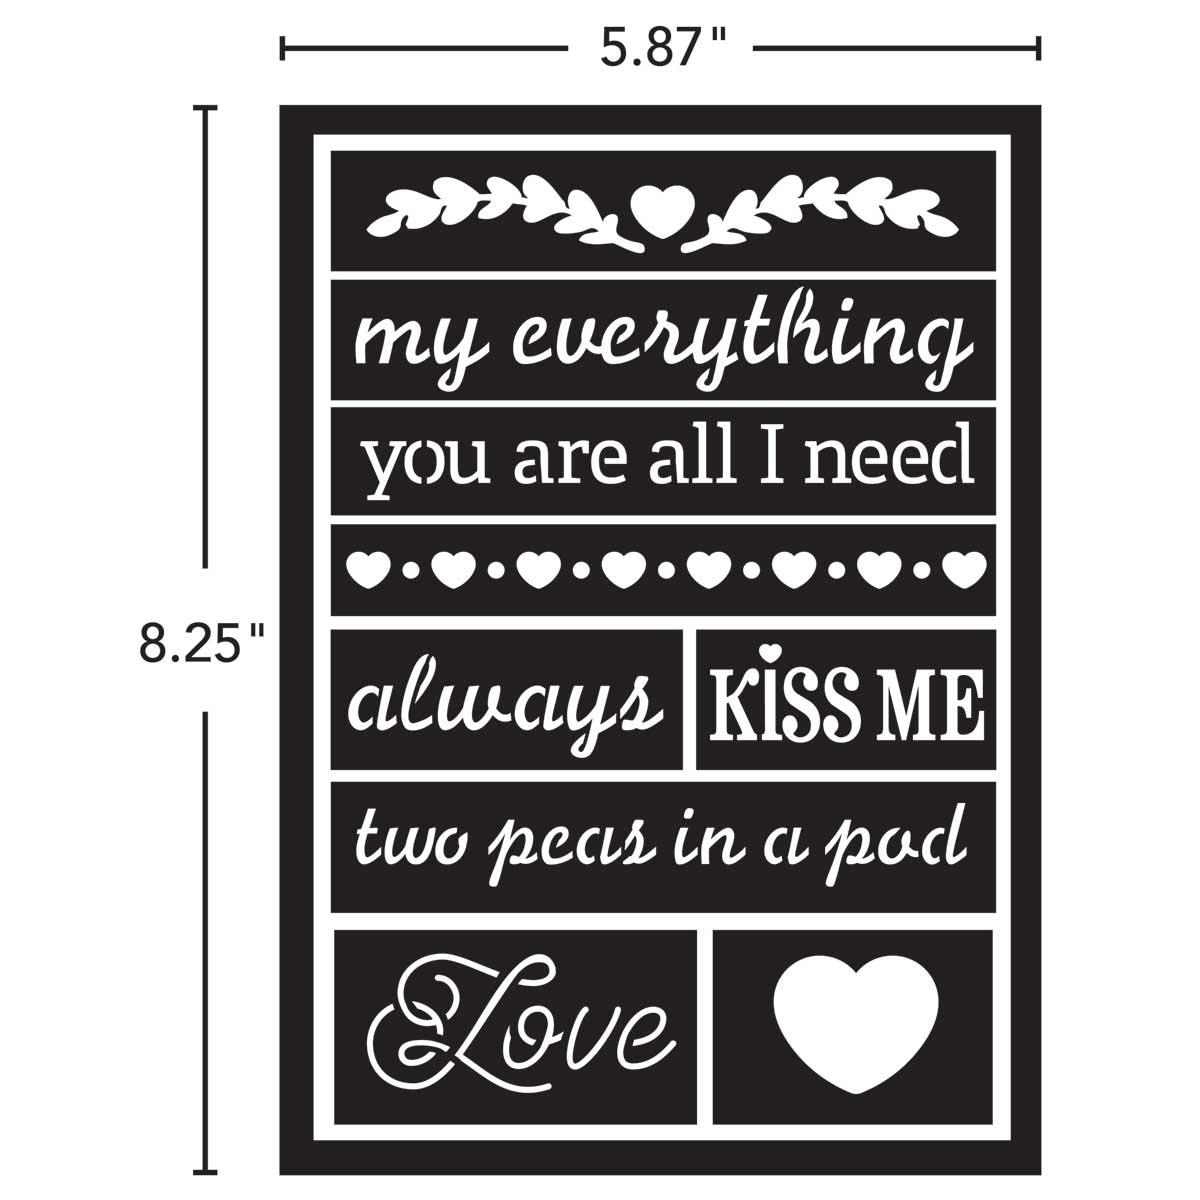 FolkArt ® Peel & Stick Painting Stencils - Loving Words - 63242